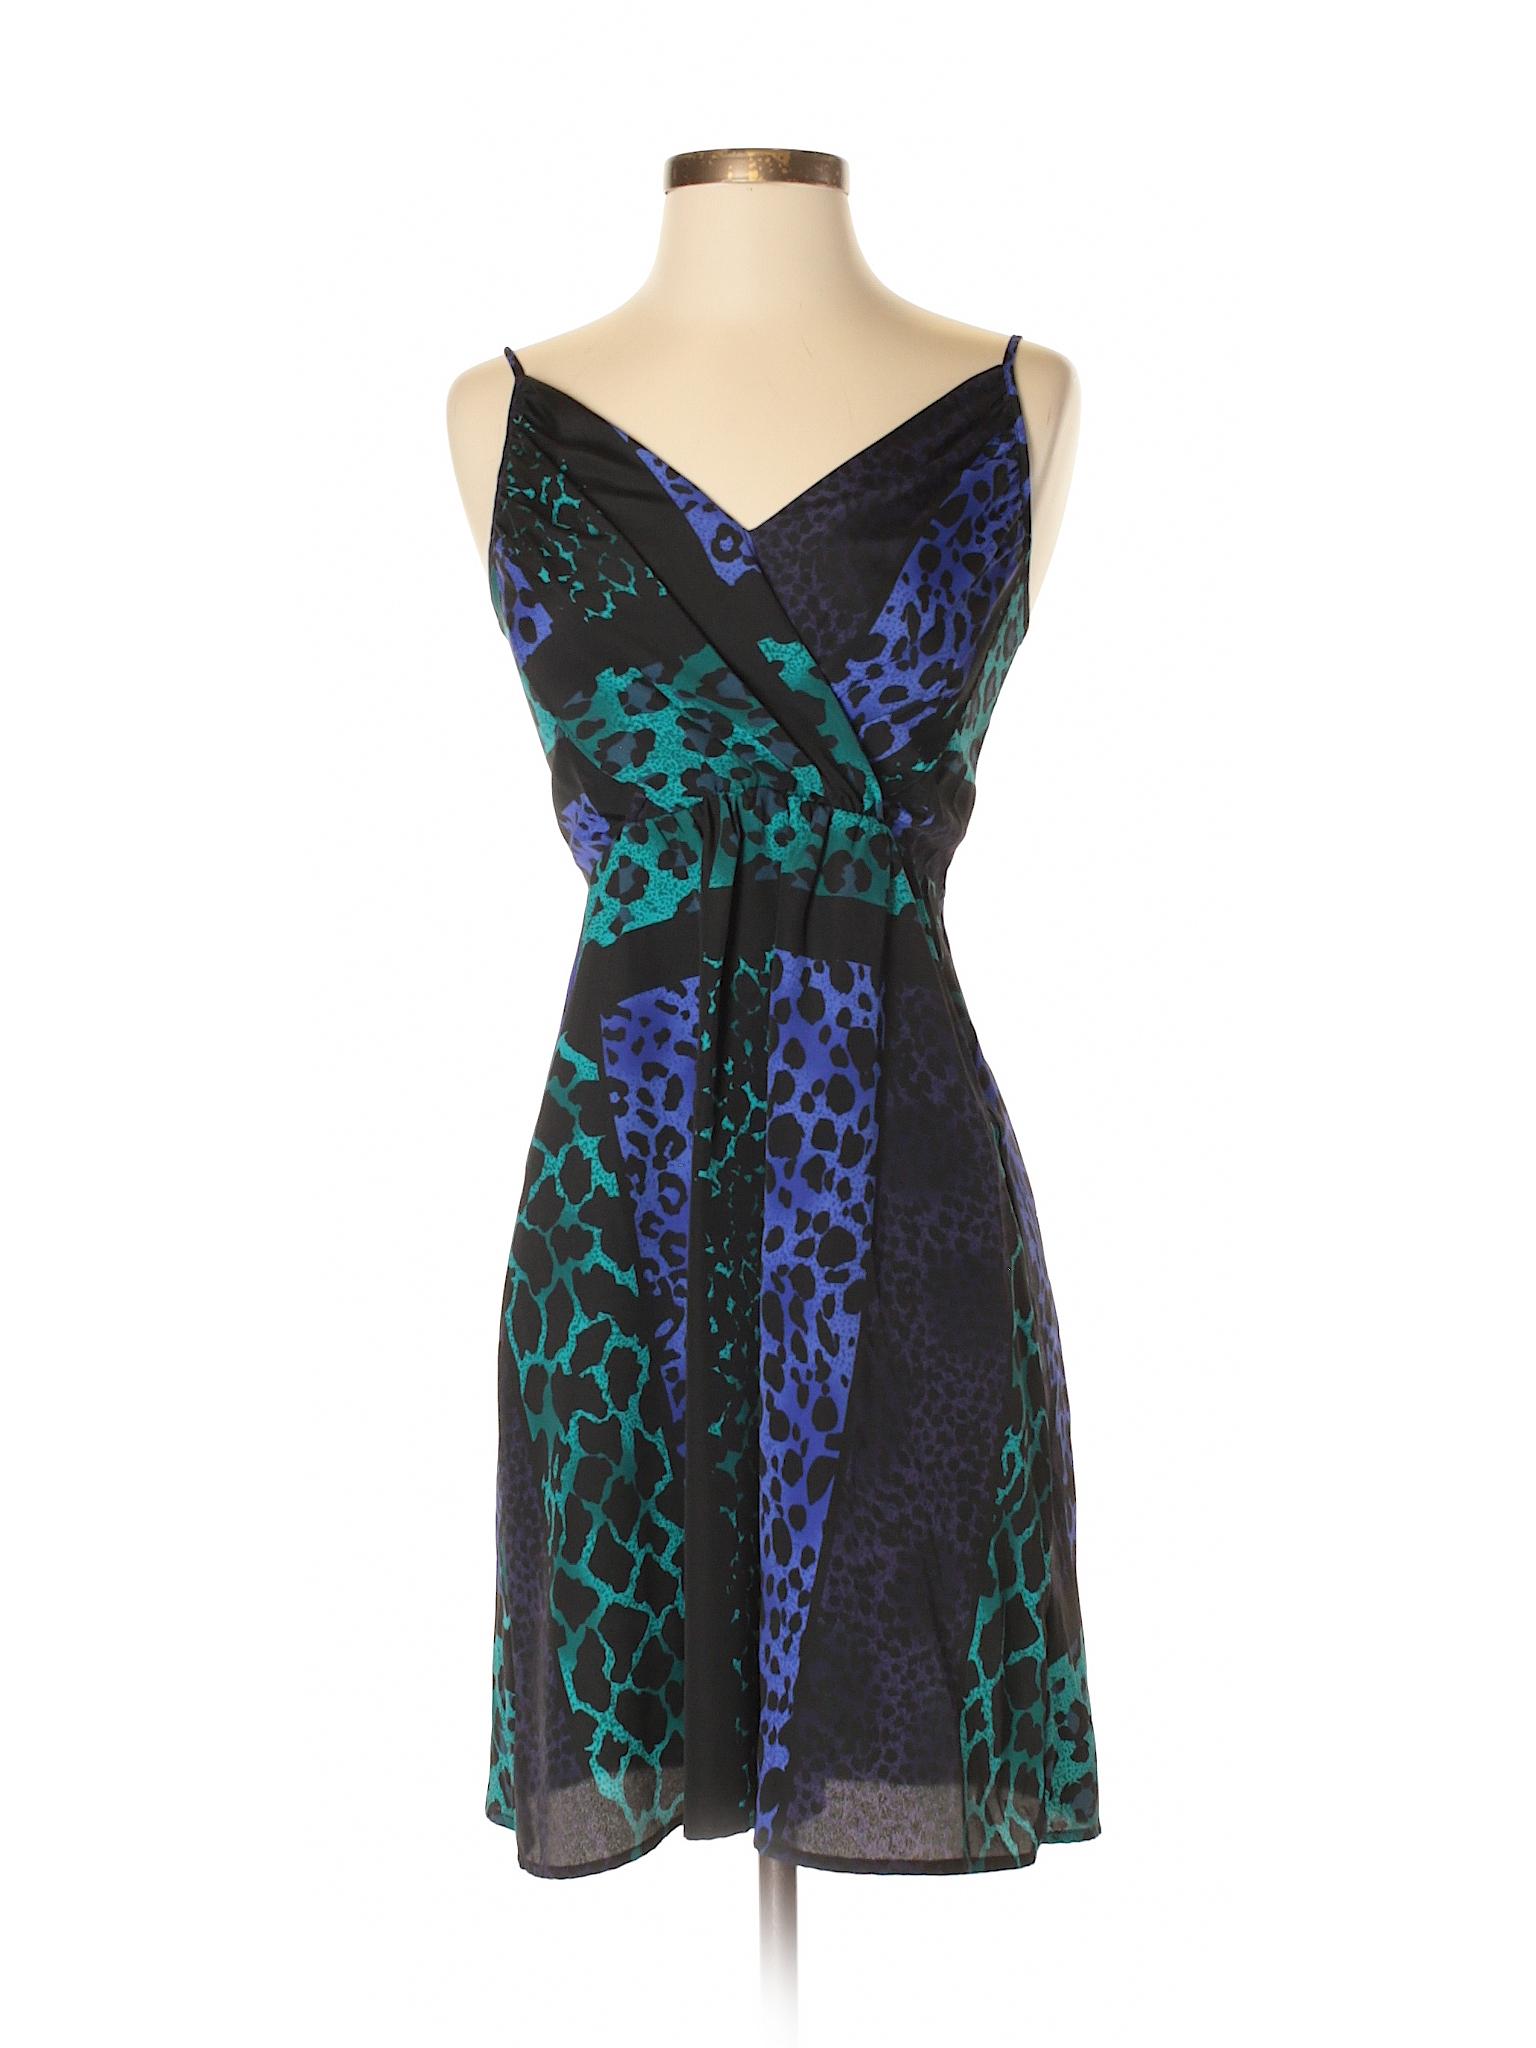 Kim Casual Yumi winter Boutique Dress xEUC7Ww8